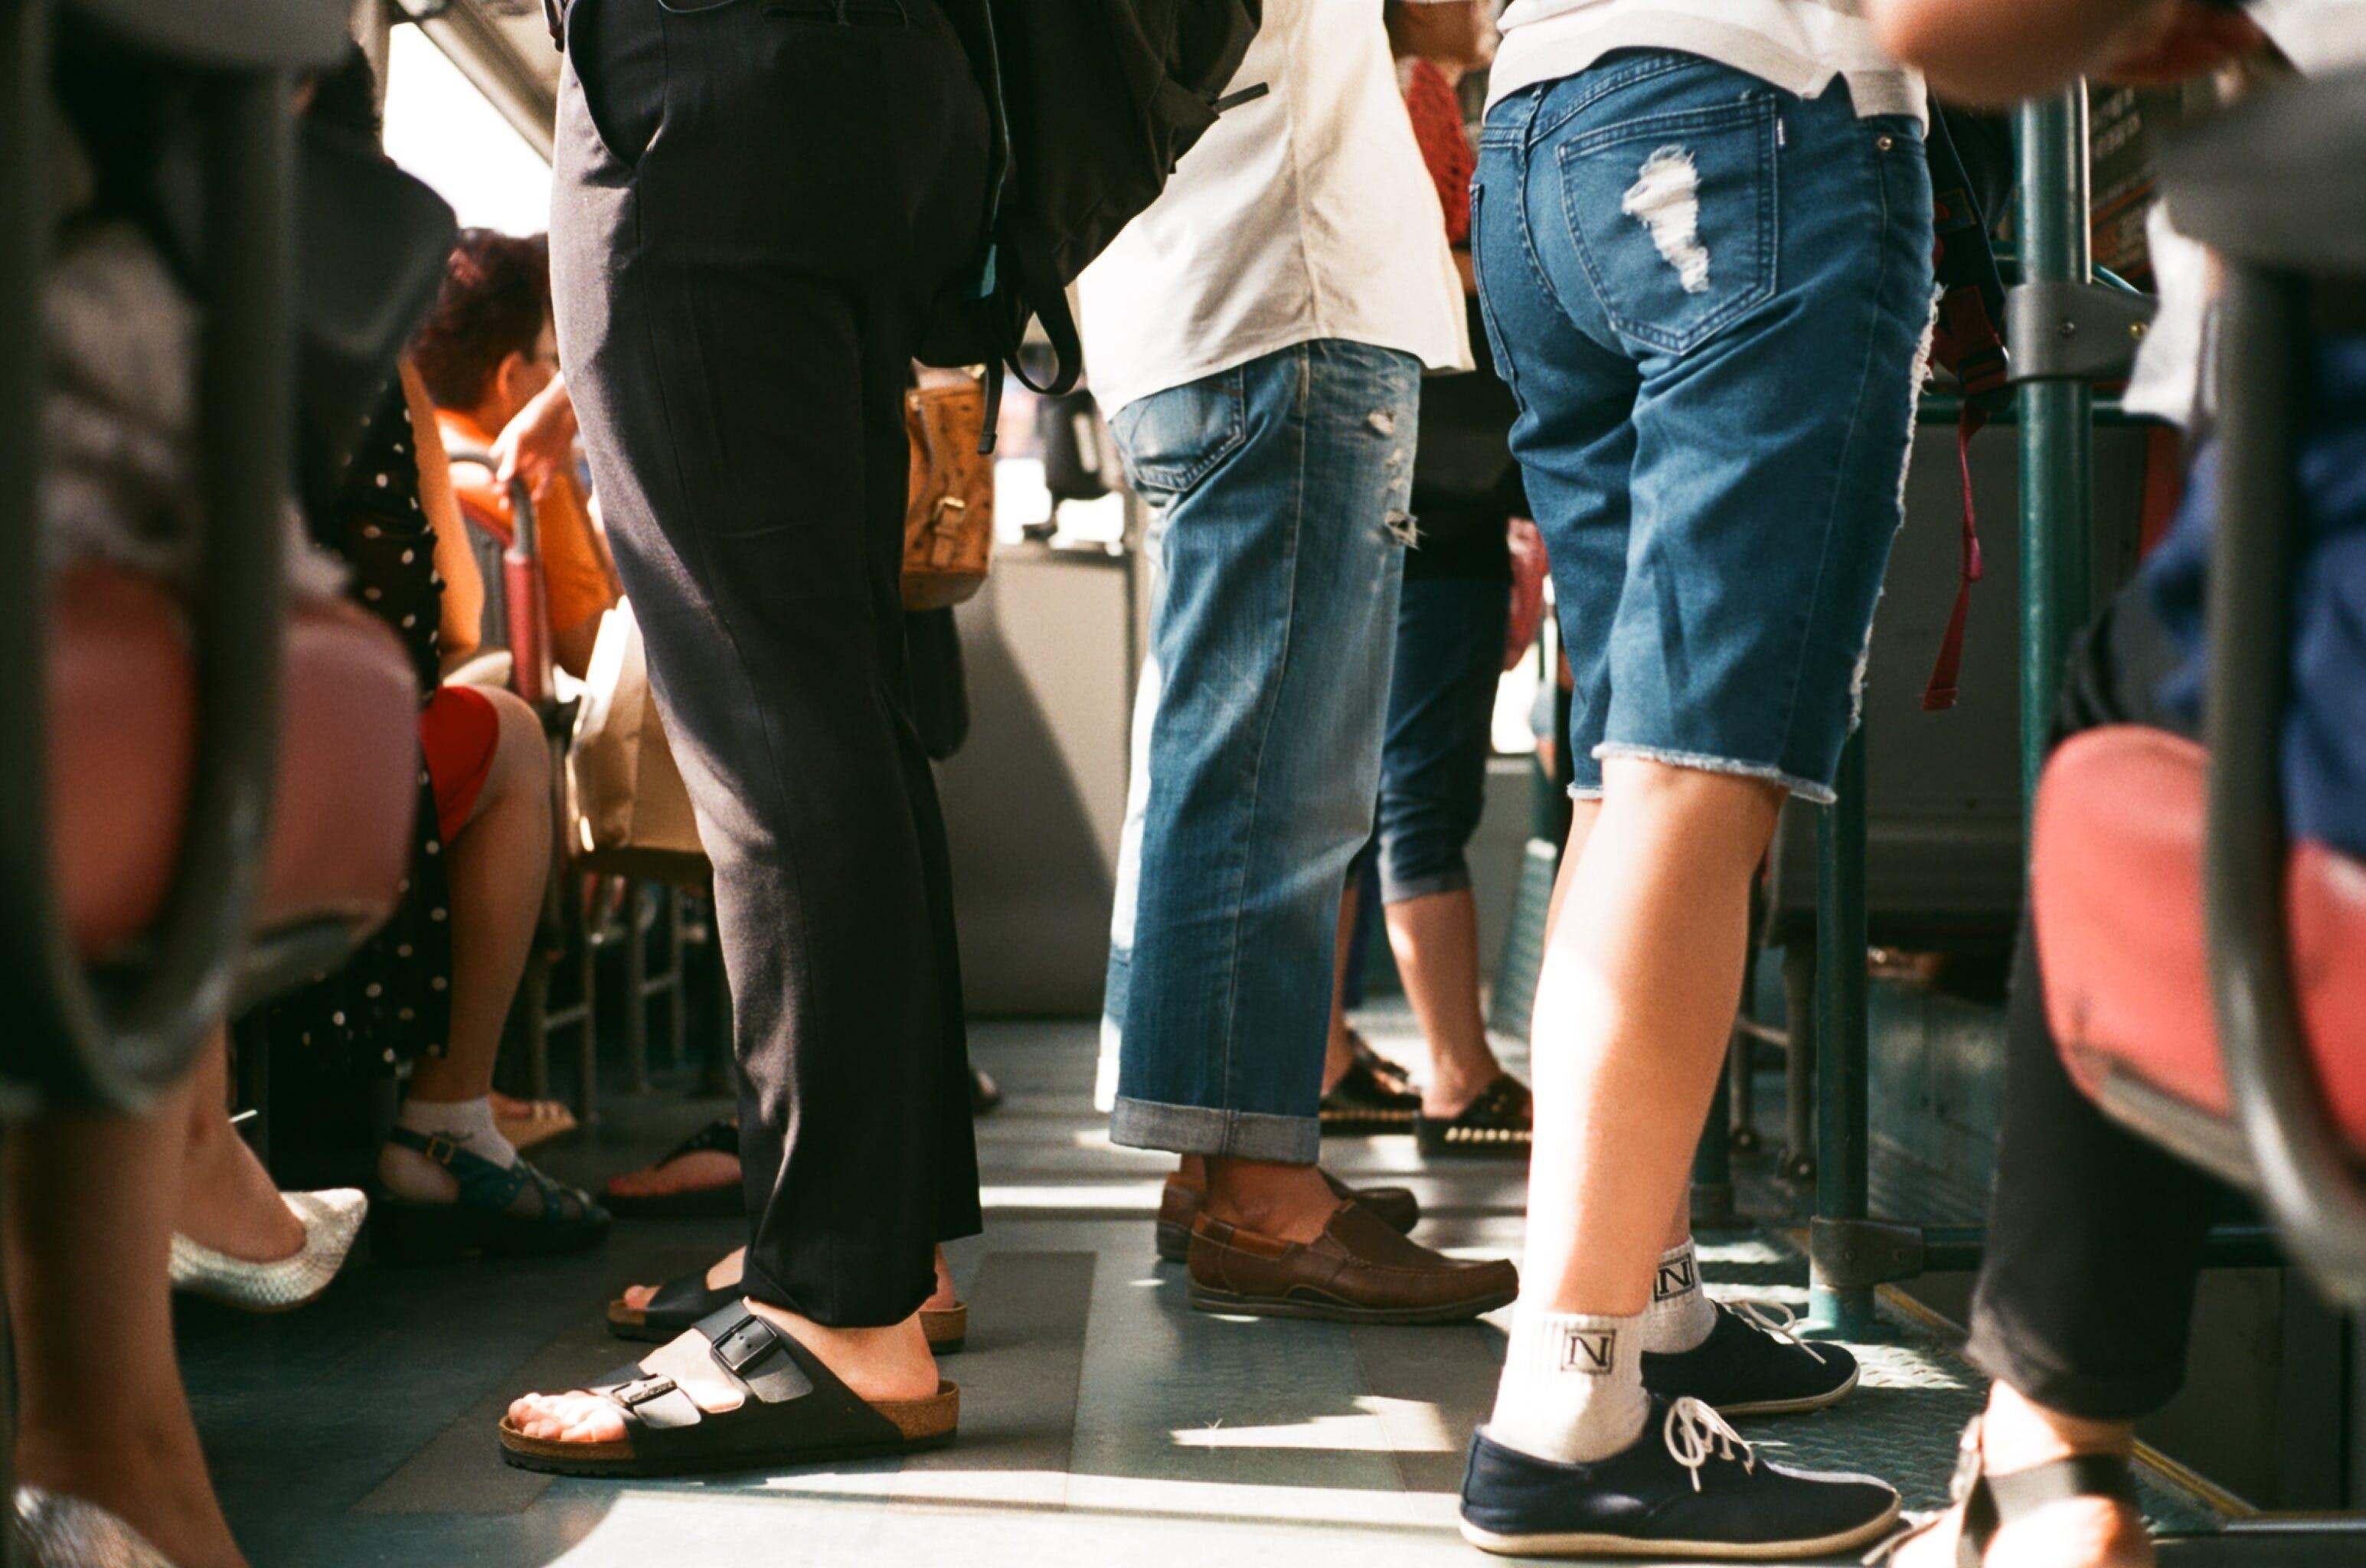 Free stock photo of feet, legs, travelling, tram